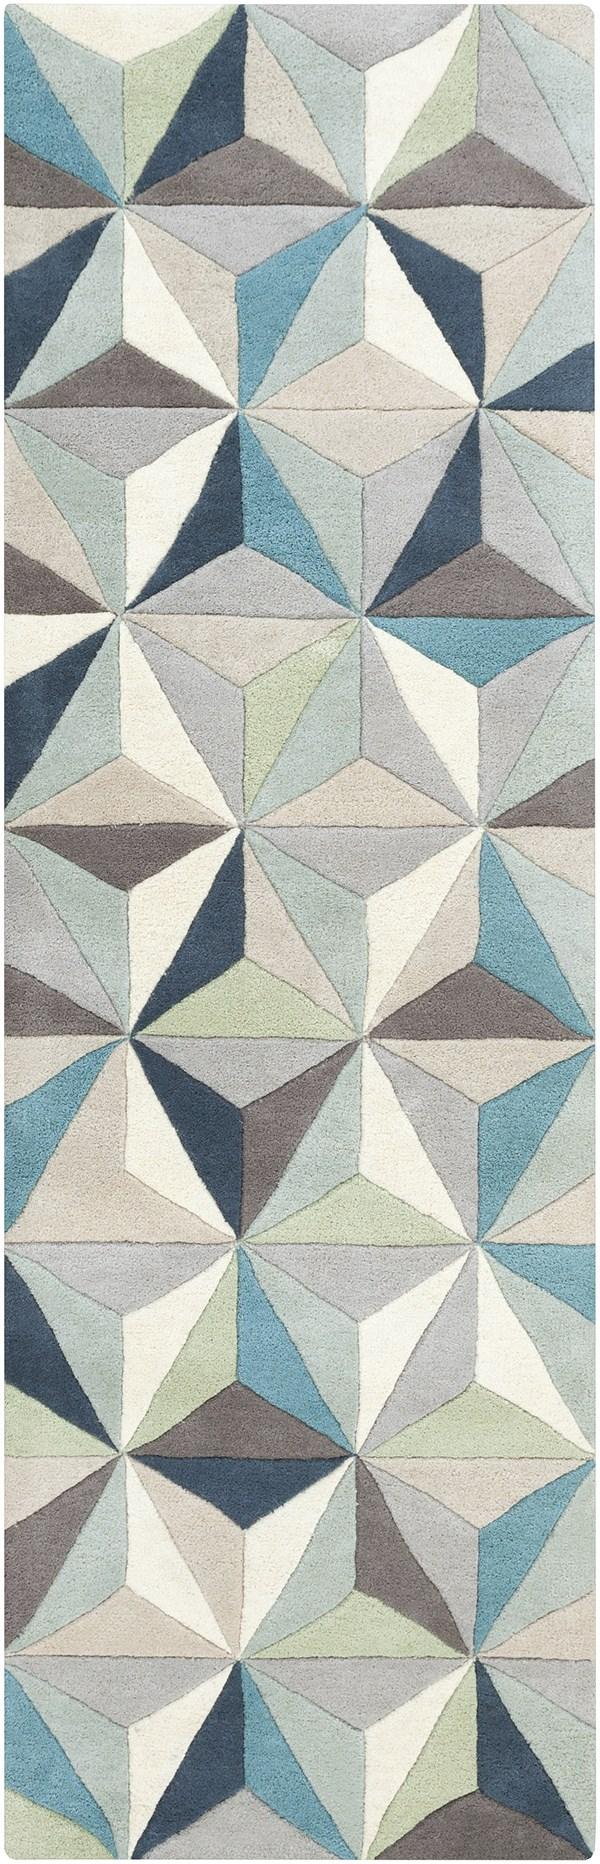 Sky Blue, Medium Gray, Sage, Charcoal, Beige Contemporary / Modern Area Rug